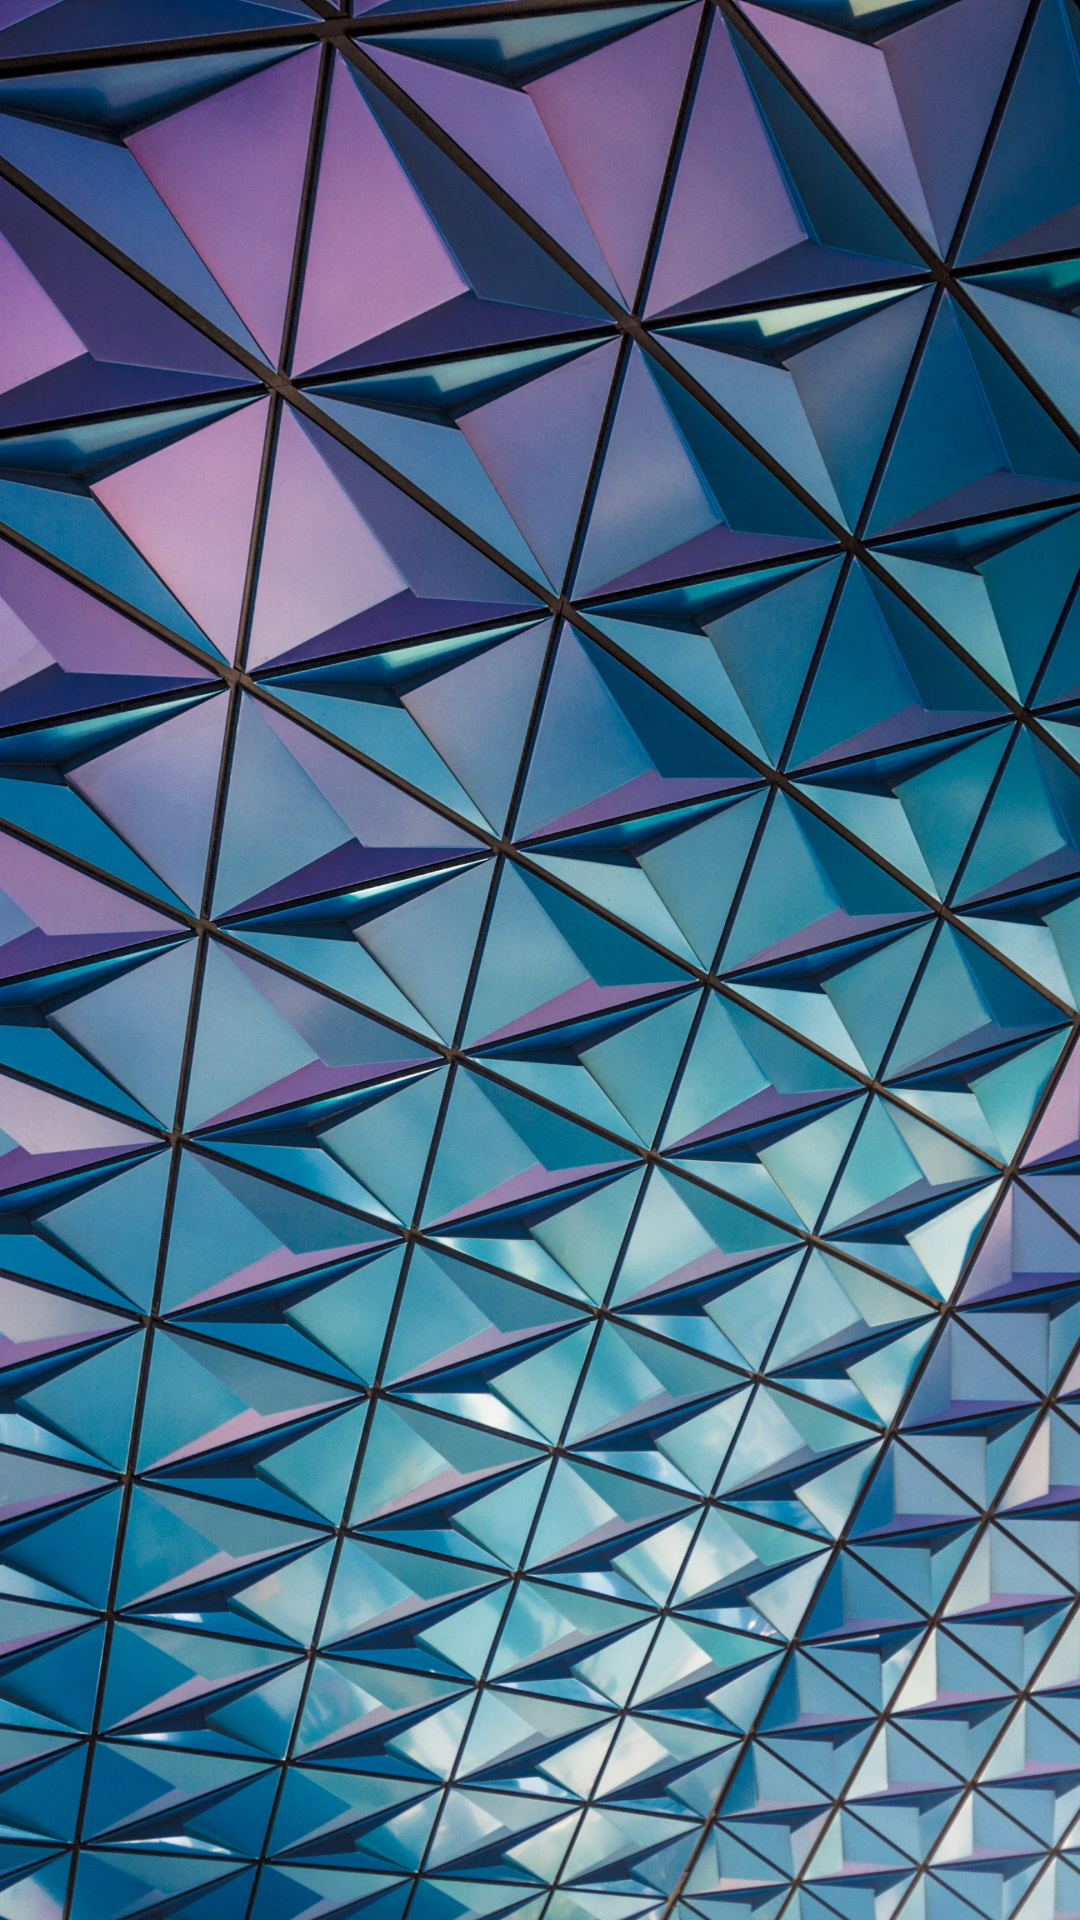 Purple Mosaic iPhone Wallpaper